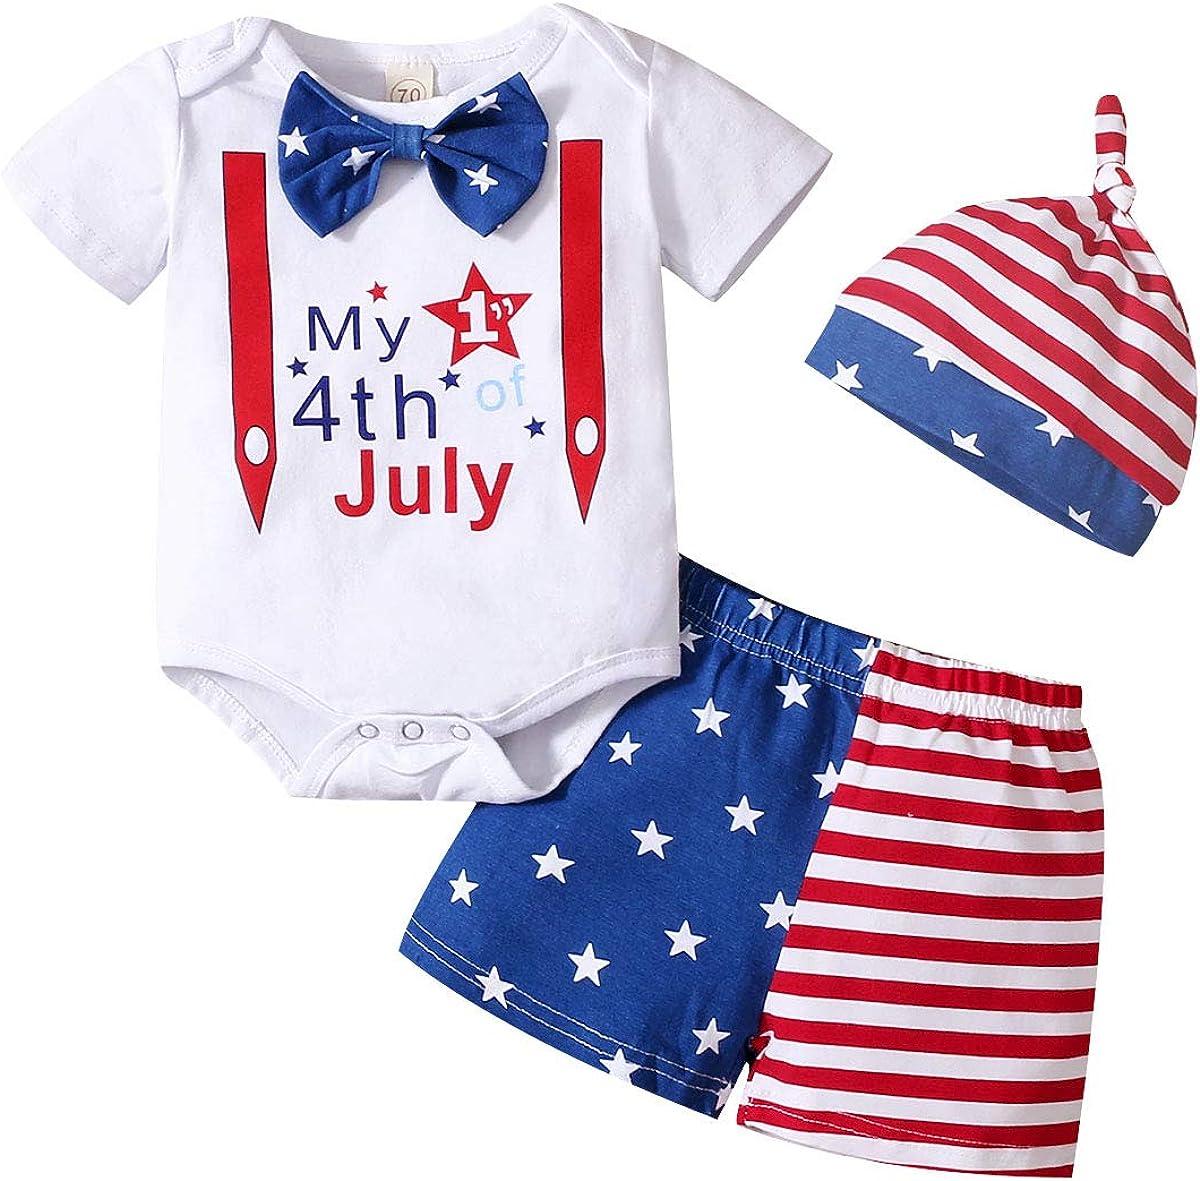 Baby Boy 3Pcs 4th of July Outfits Set Shorts Sets Cartoon Romper Shirt+USA Flag Shorts+ Stripe Hat